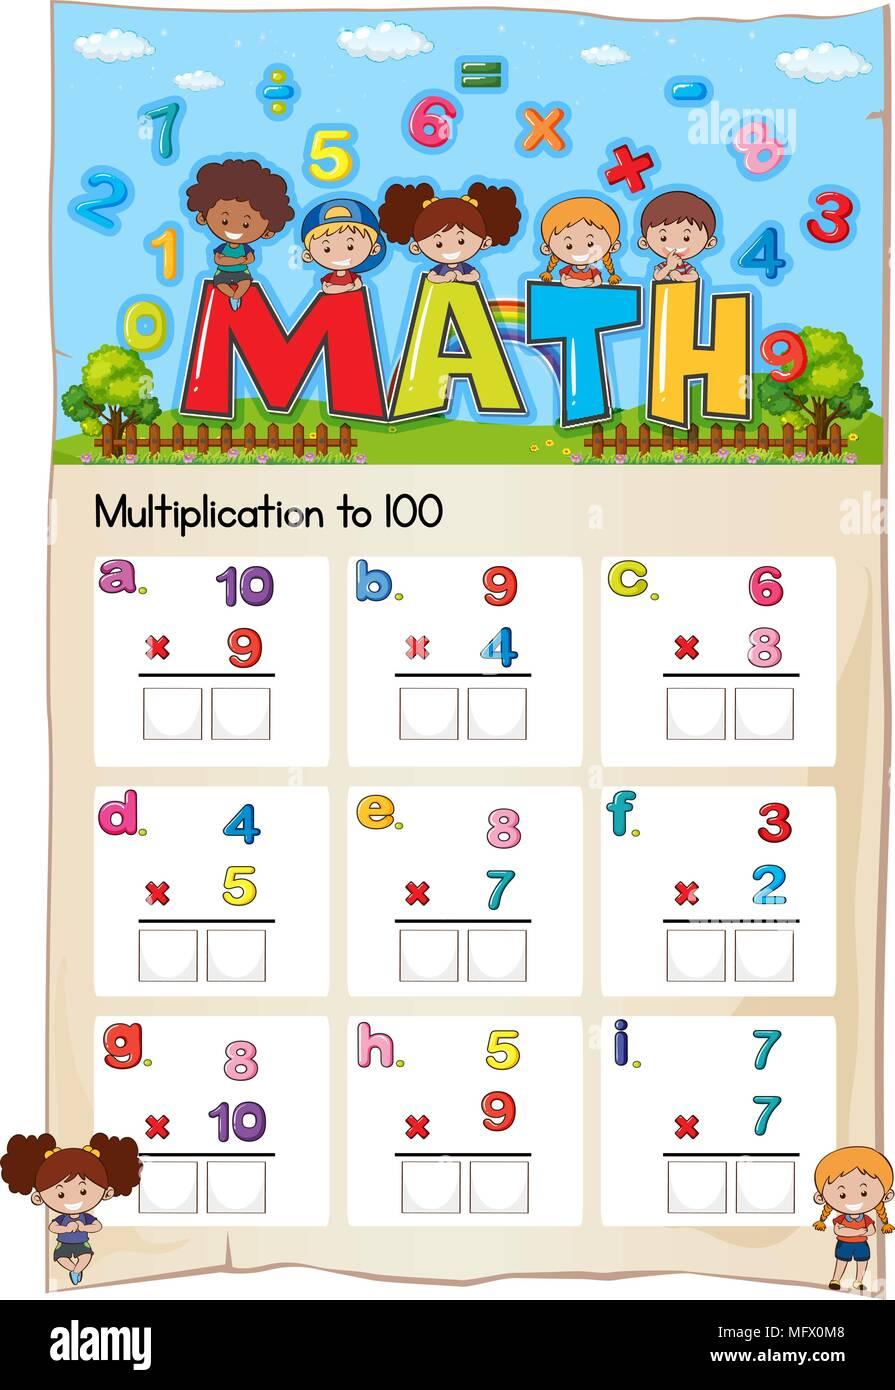 Charmant Algebra Mathematik Arbeitsblatt Ideen - Arbeitsblatt Schule ...